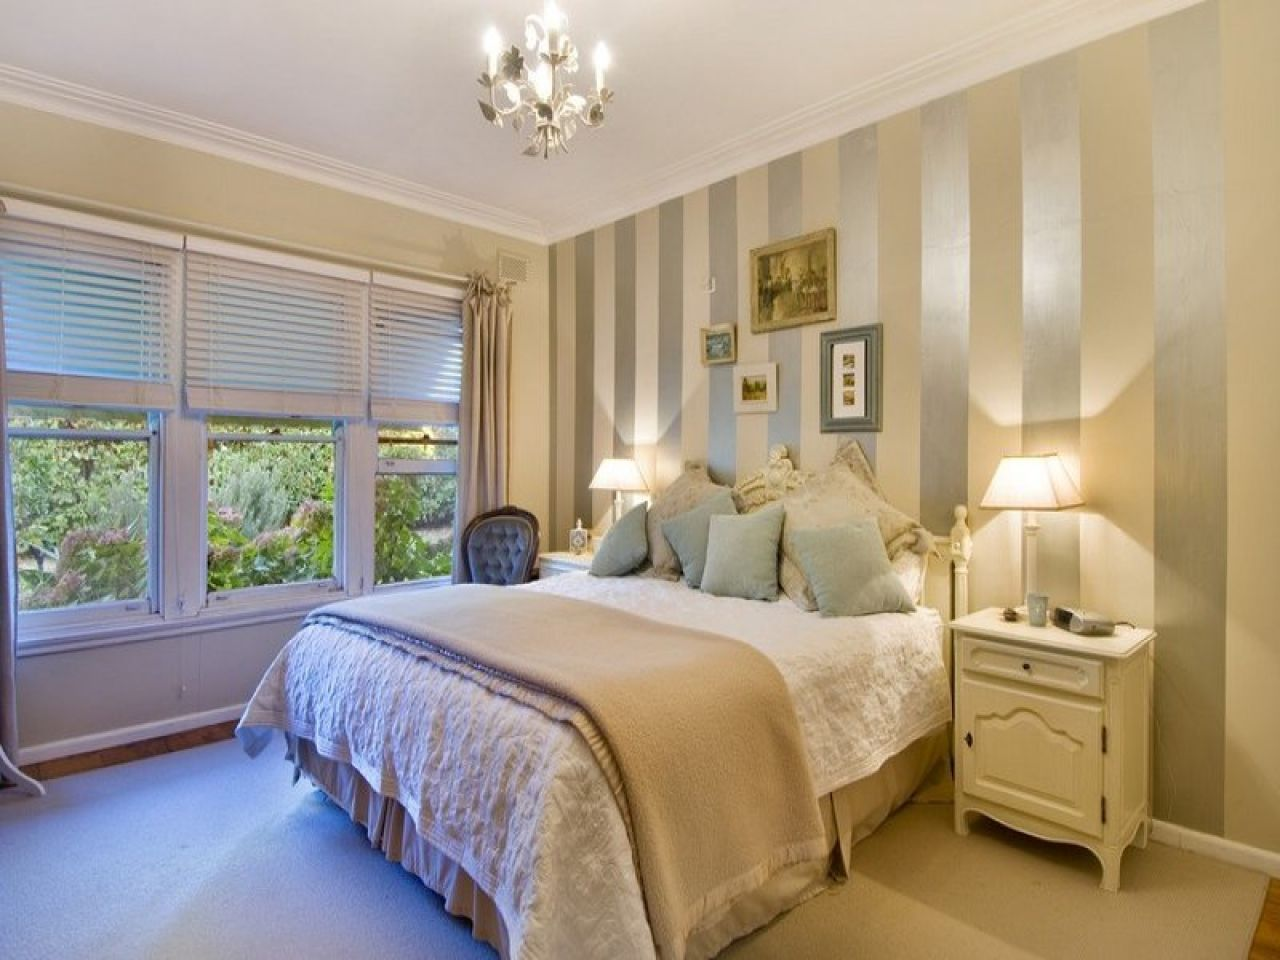 Bedroom Excellent Cream And Gold Bedroom Beige Carpet Bedroom Ideas Carpet Vidalondon Cream And Gold Beige